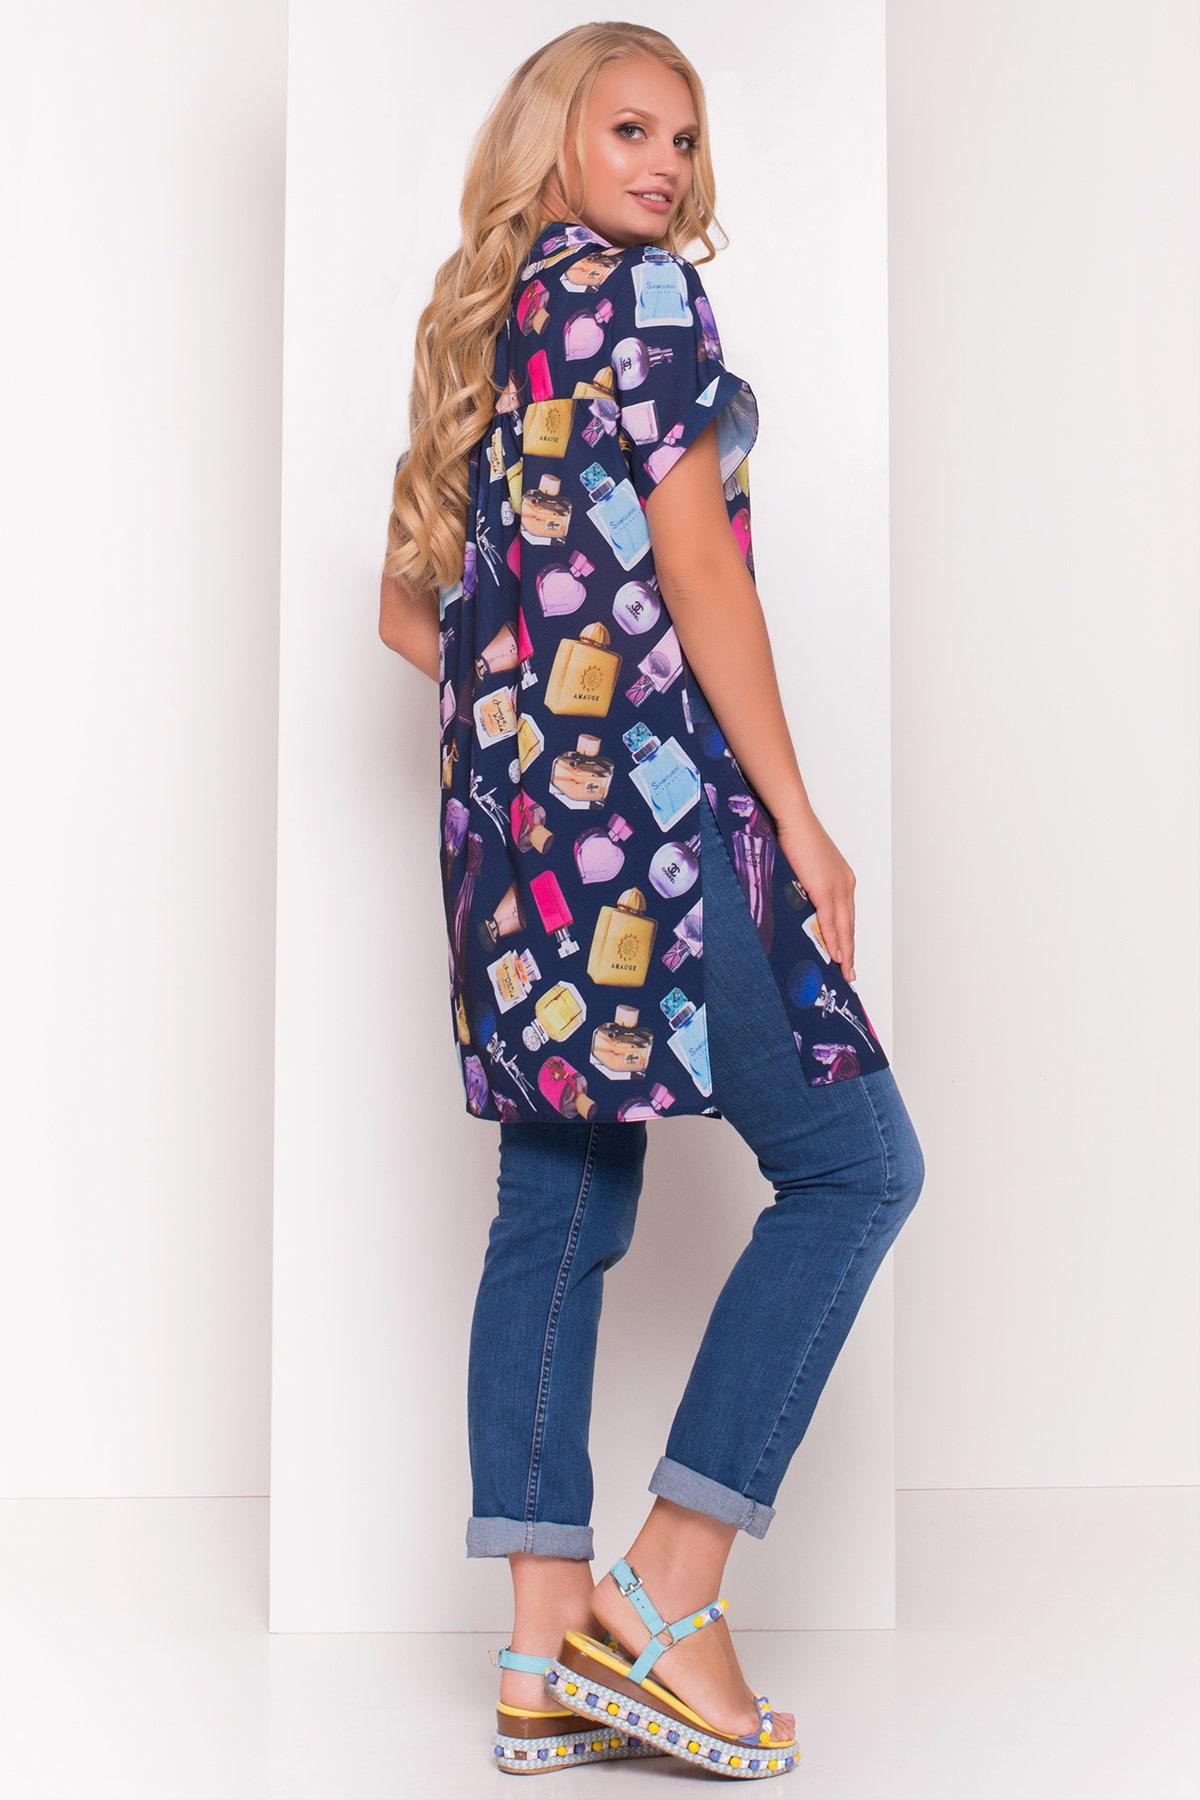 TW Платье -рубашка Шиен Donna 5239 Цвет: Темно-синий духи